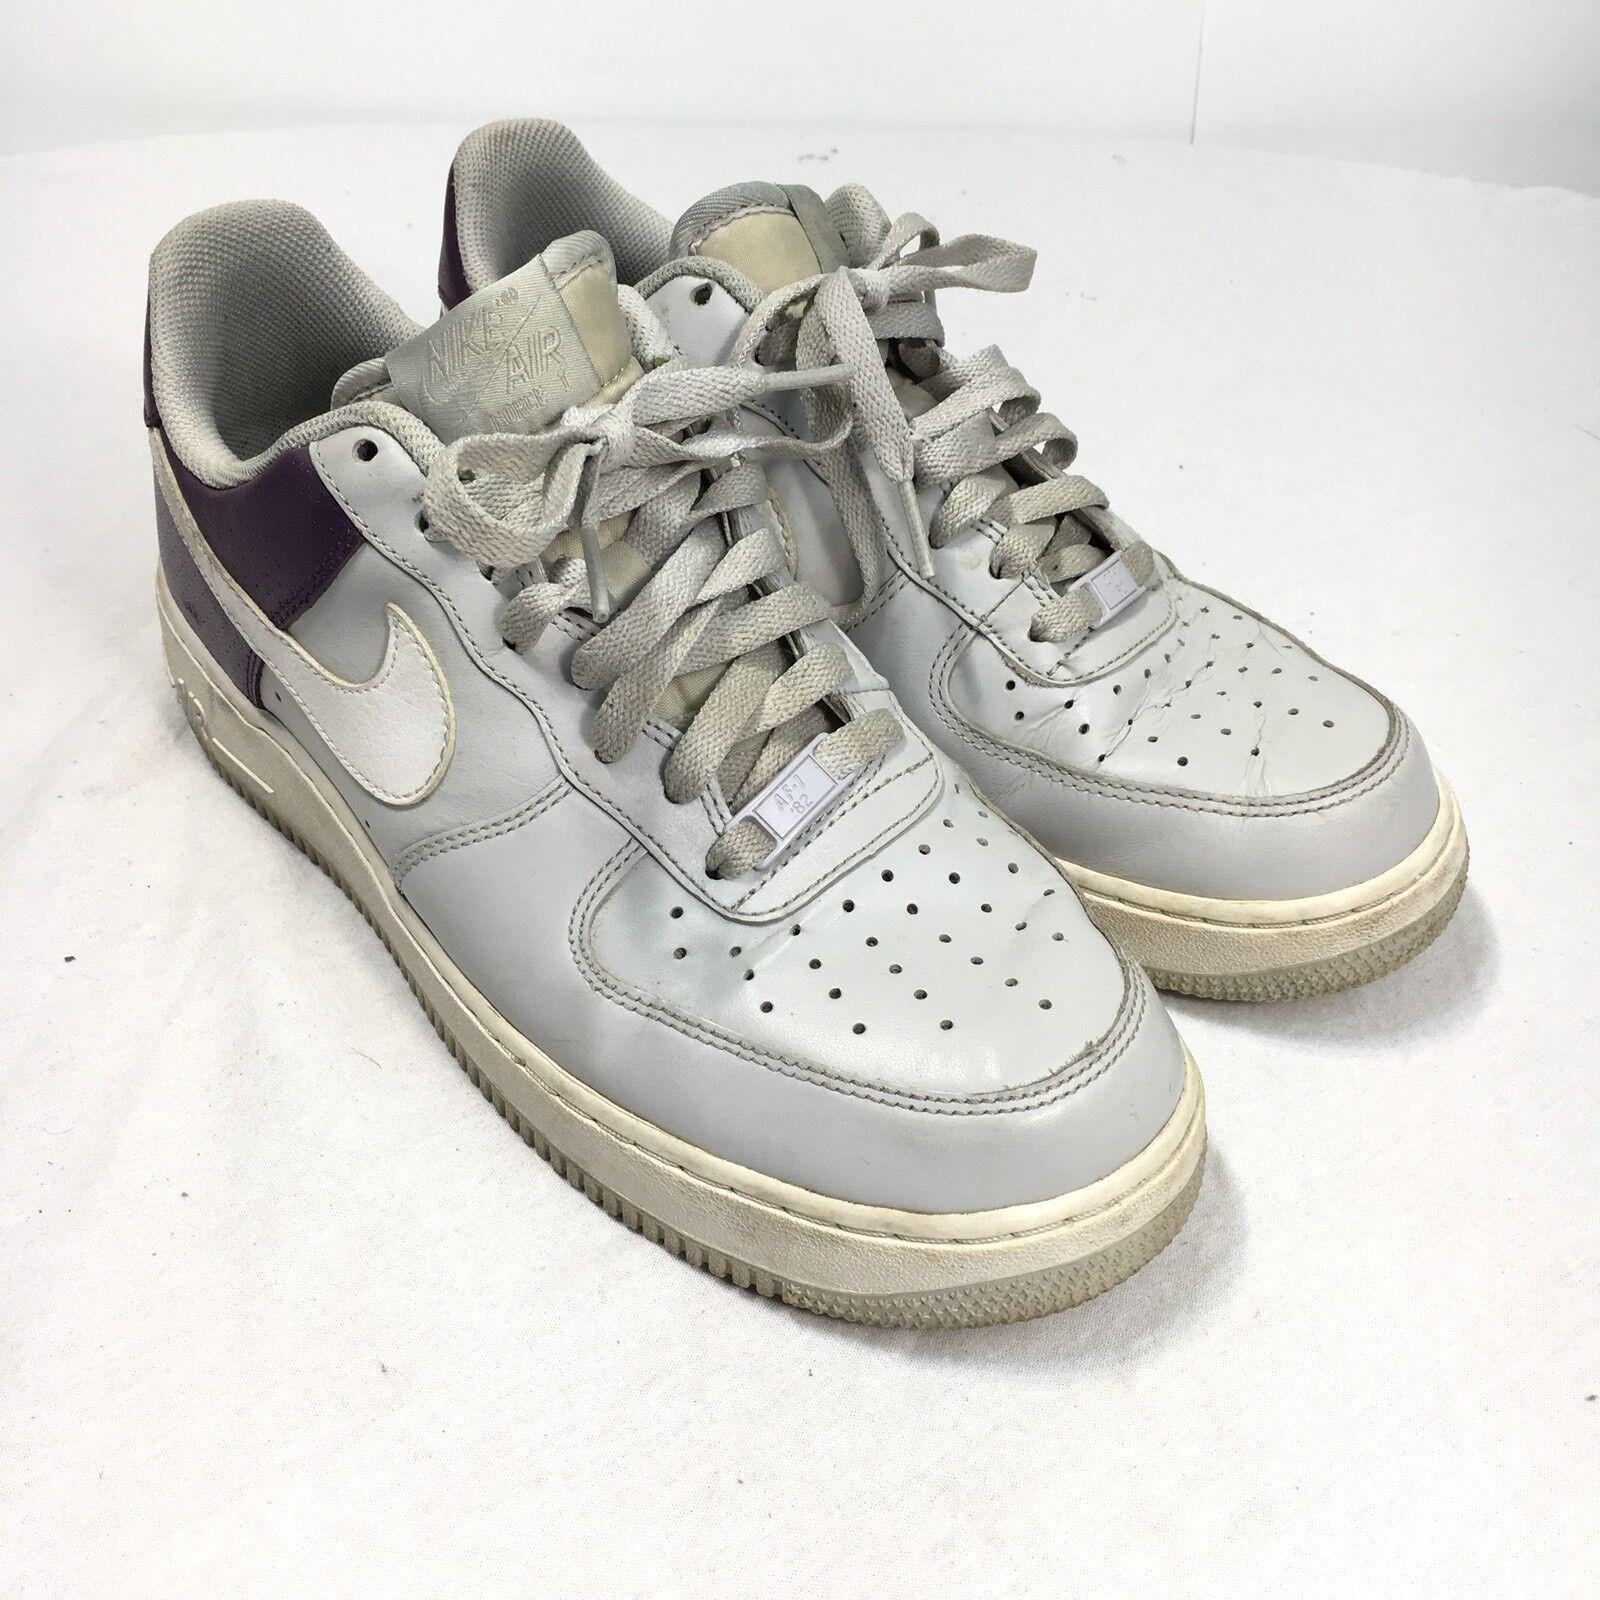 newest 27804 f7d16 Nike Air Force 1 AF 1 hombre 9 baloncesto blanco morado zapatos de  baloncesto 9 315122 Athletic 2b9547